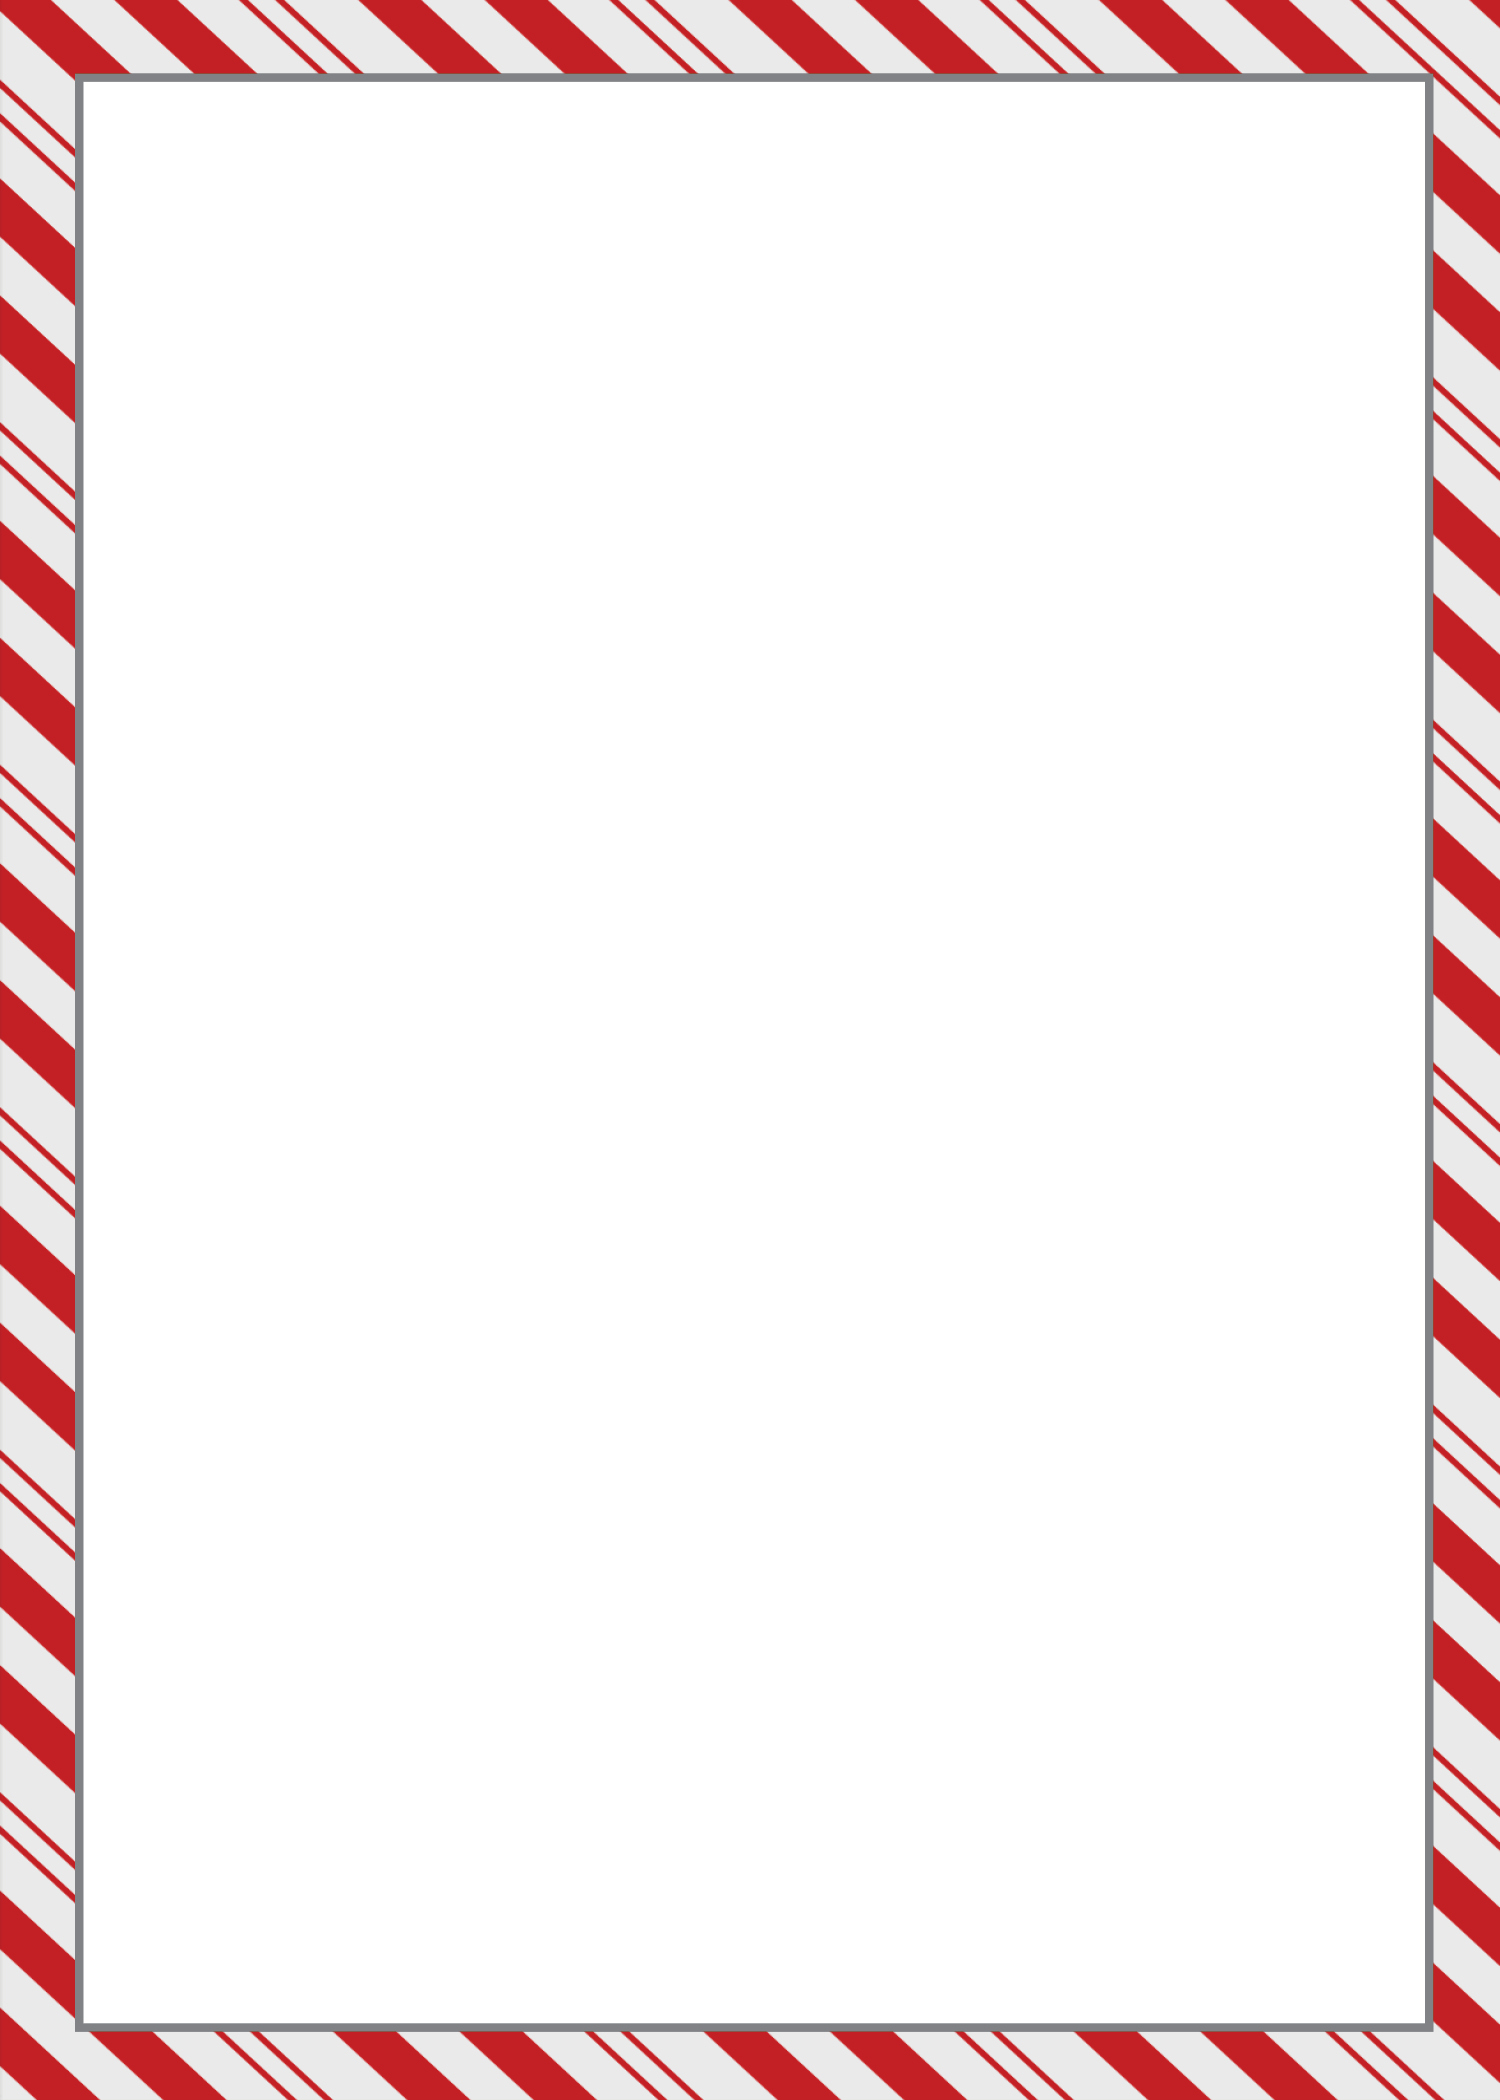 Clip Art Candy Cane Border Clip Art candy cane border clipart kid 5 x 7 flat card